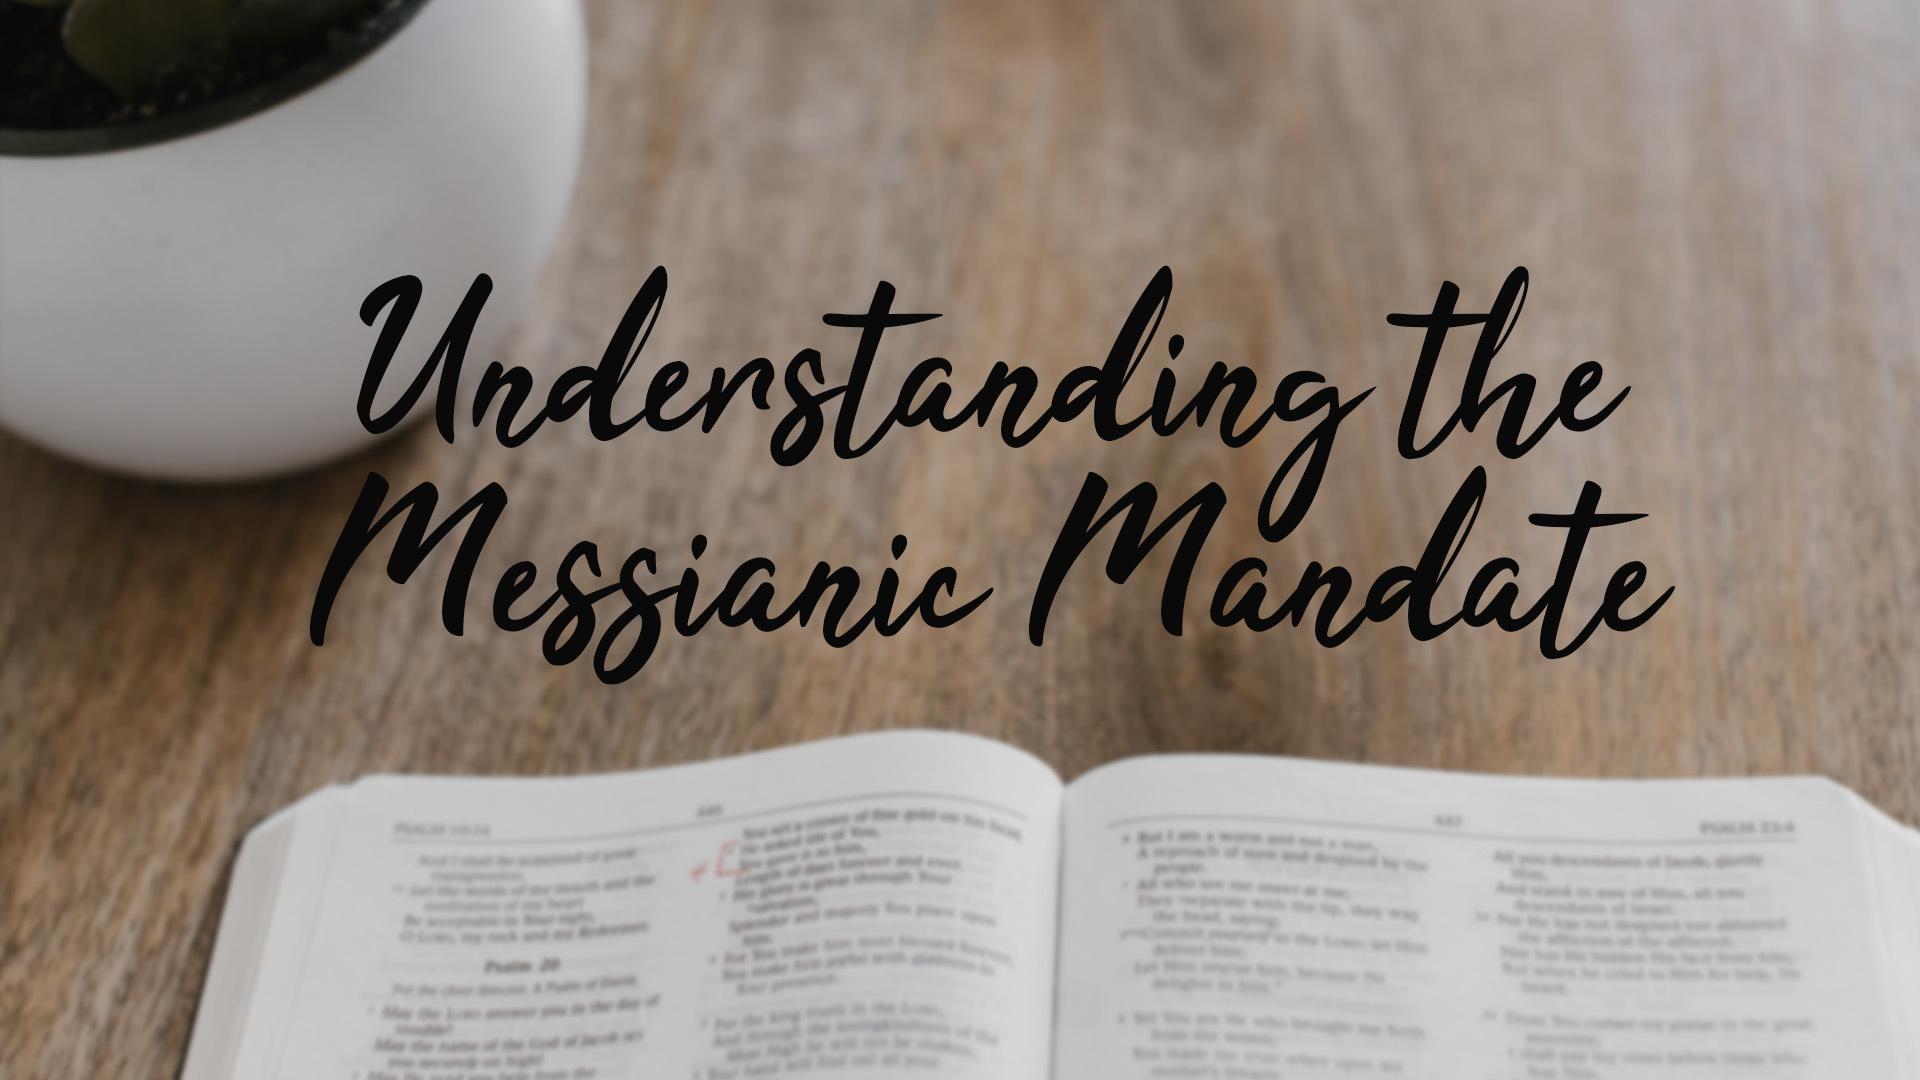 Understanding the Messianic Mandate